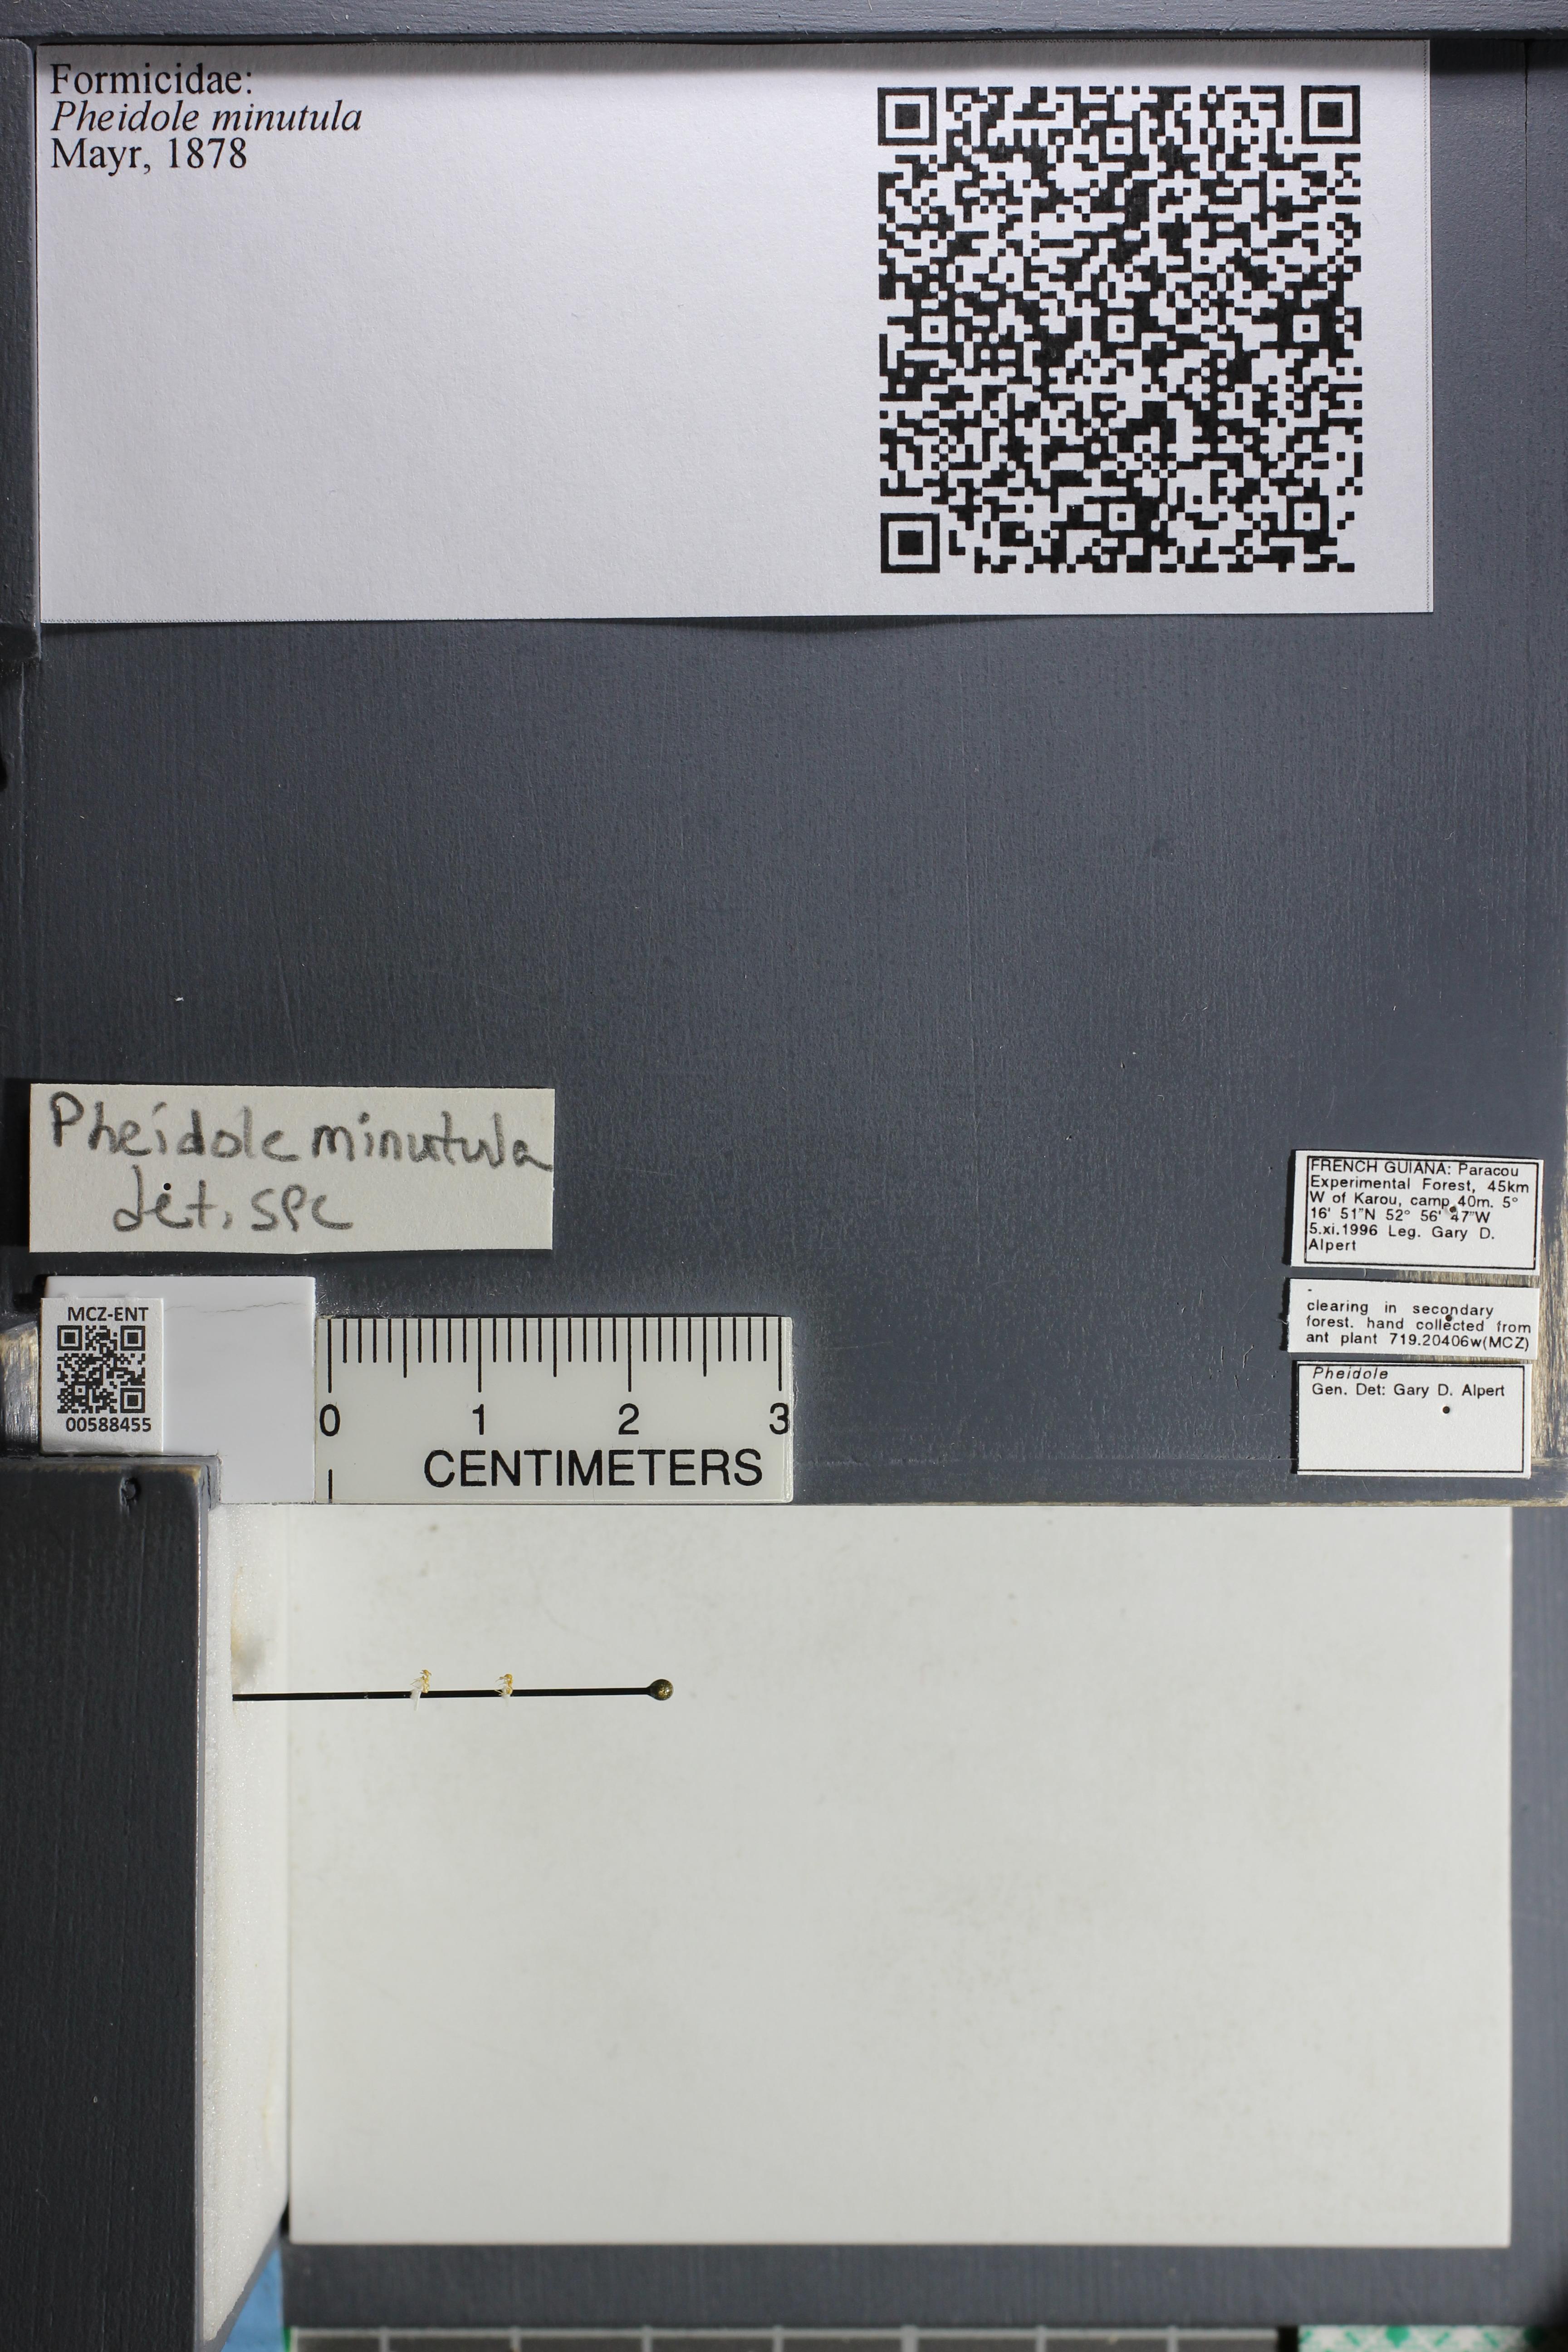 Media of type image, MCZ:Ent:588455 Identified as Pheidole minutula.